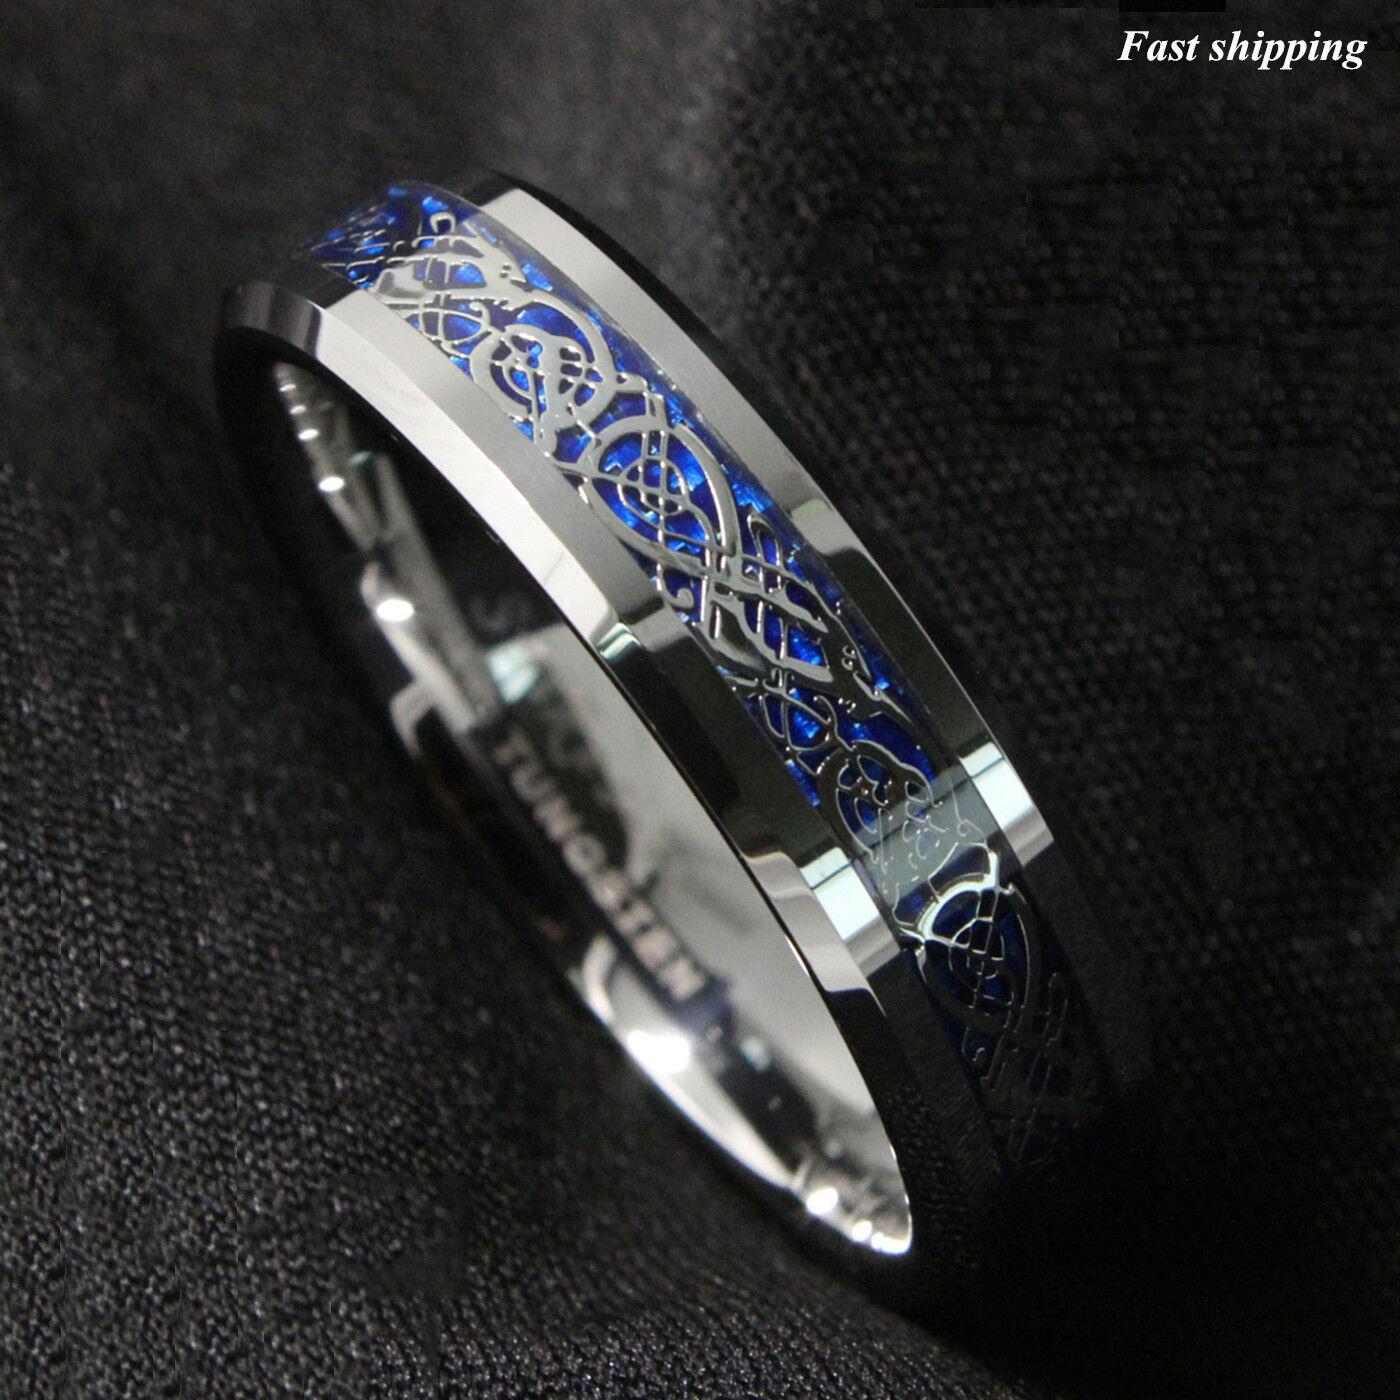 8 6Mm Silvering Celtic Dragon Tungsten Carbide Ring Wedding Band